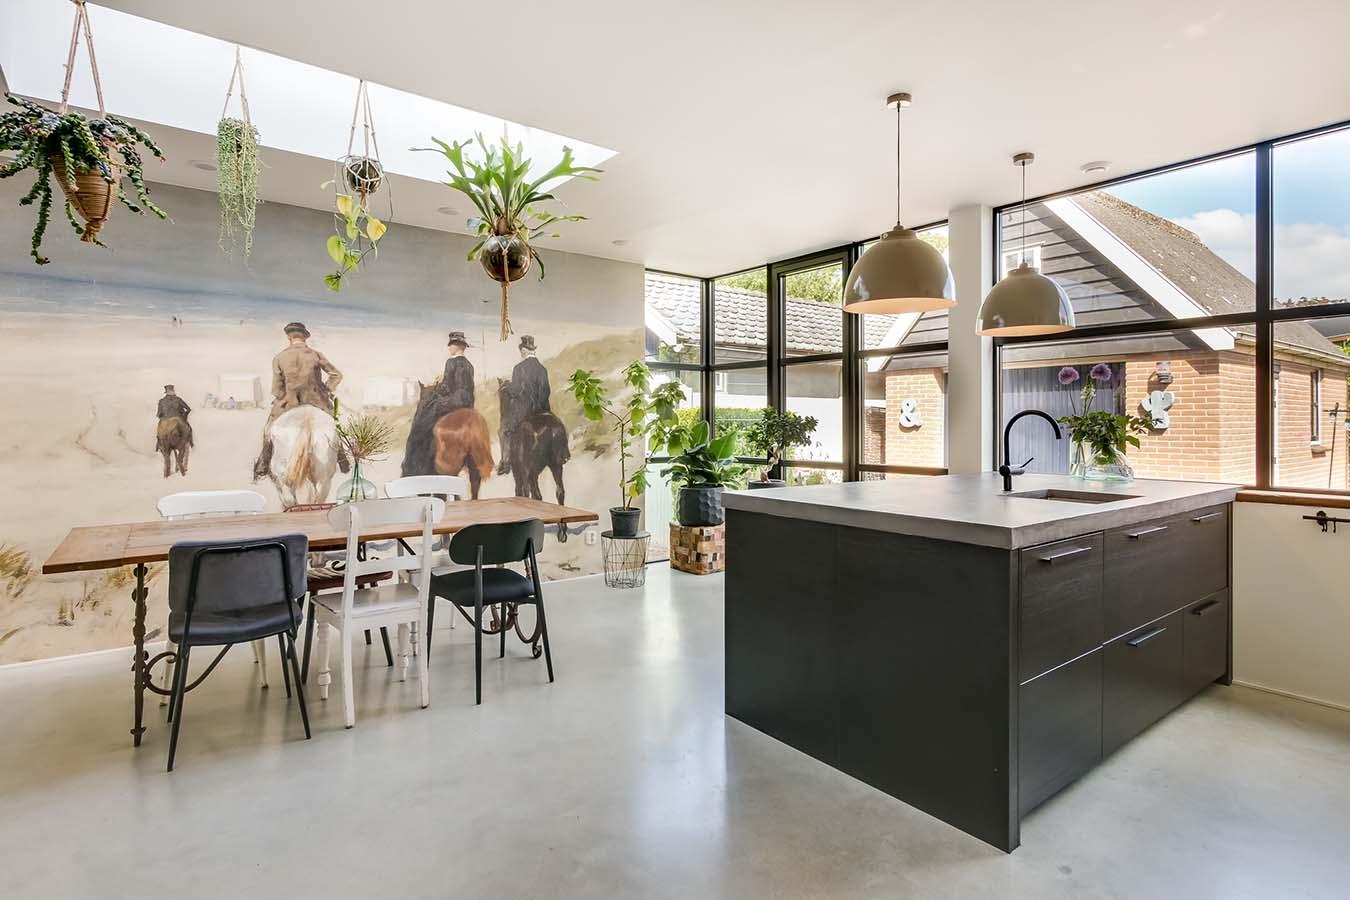 moderne keuken ergens in noord-holland